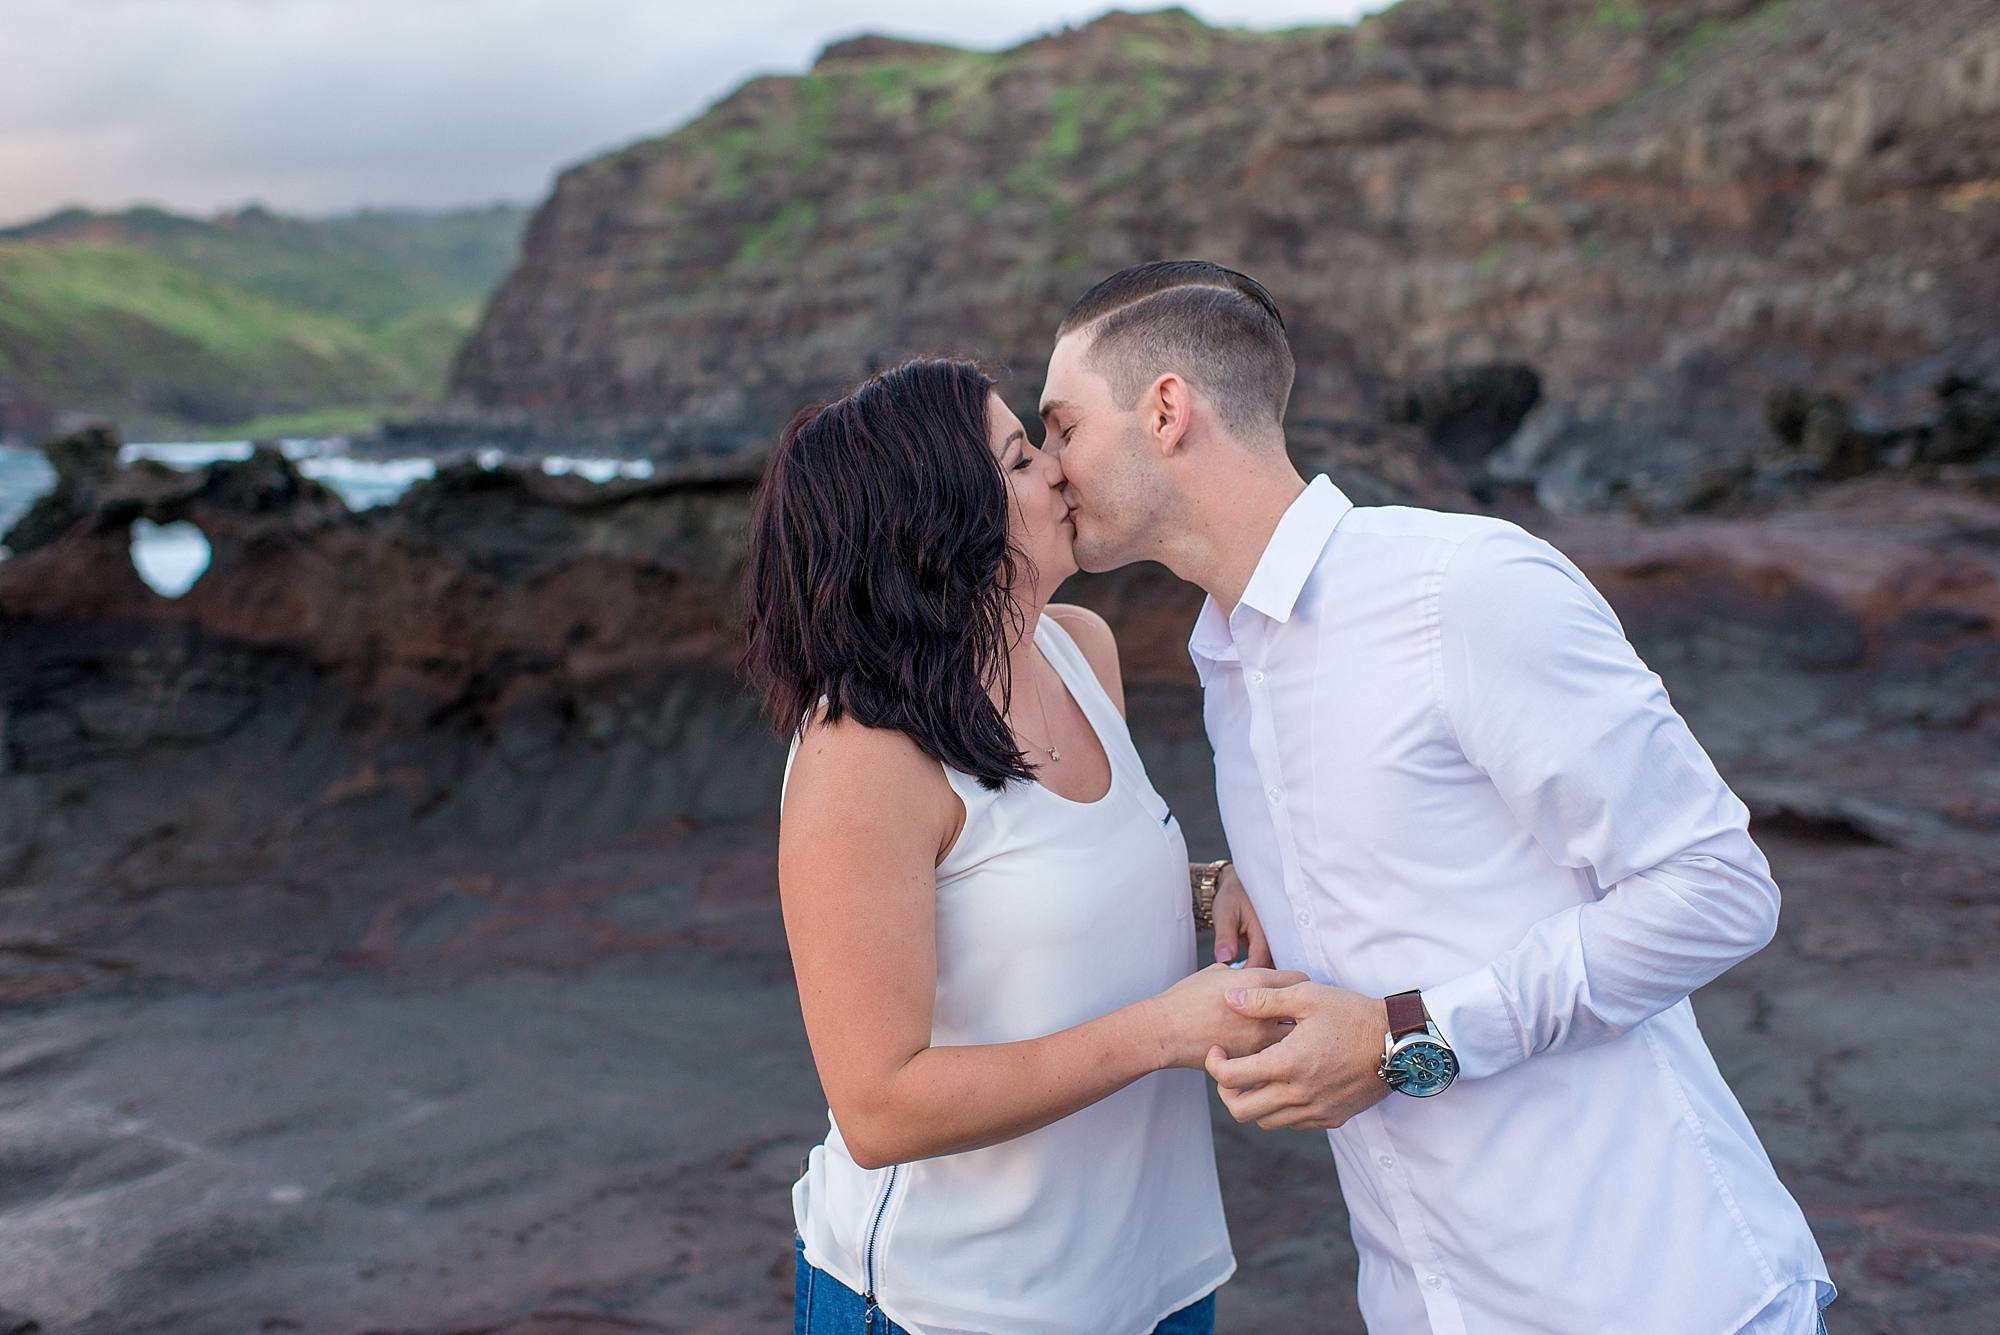 maui-sunset-proposal-at-blowhole-hawaii-proposal_0012